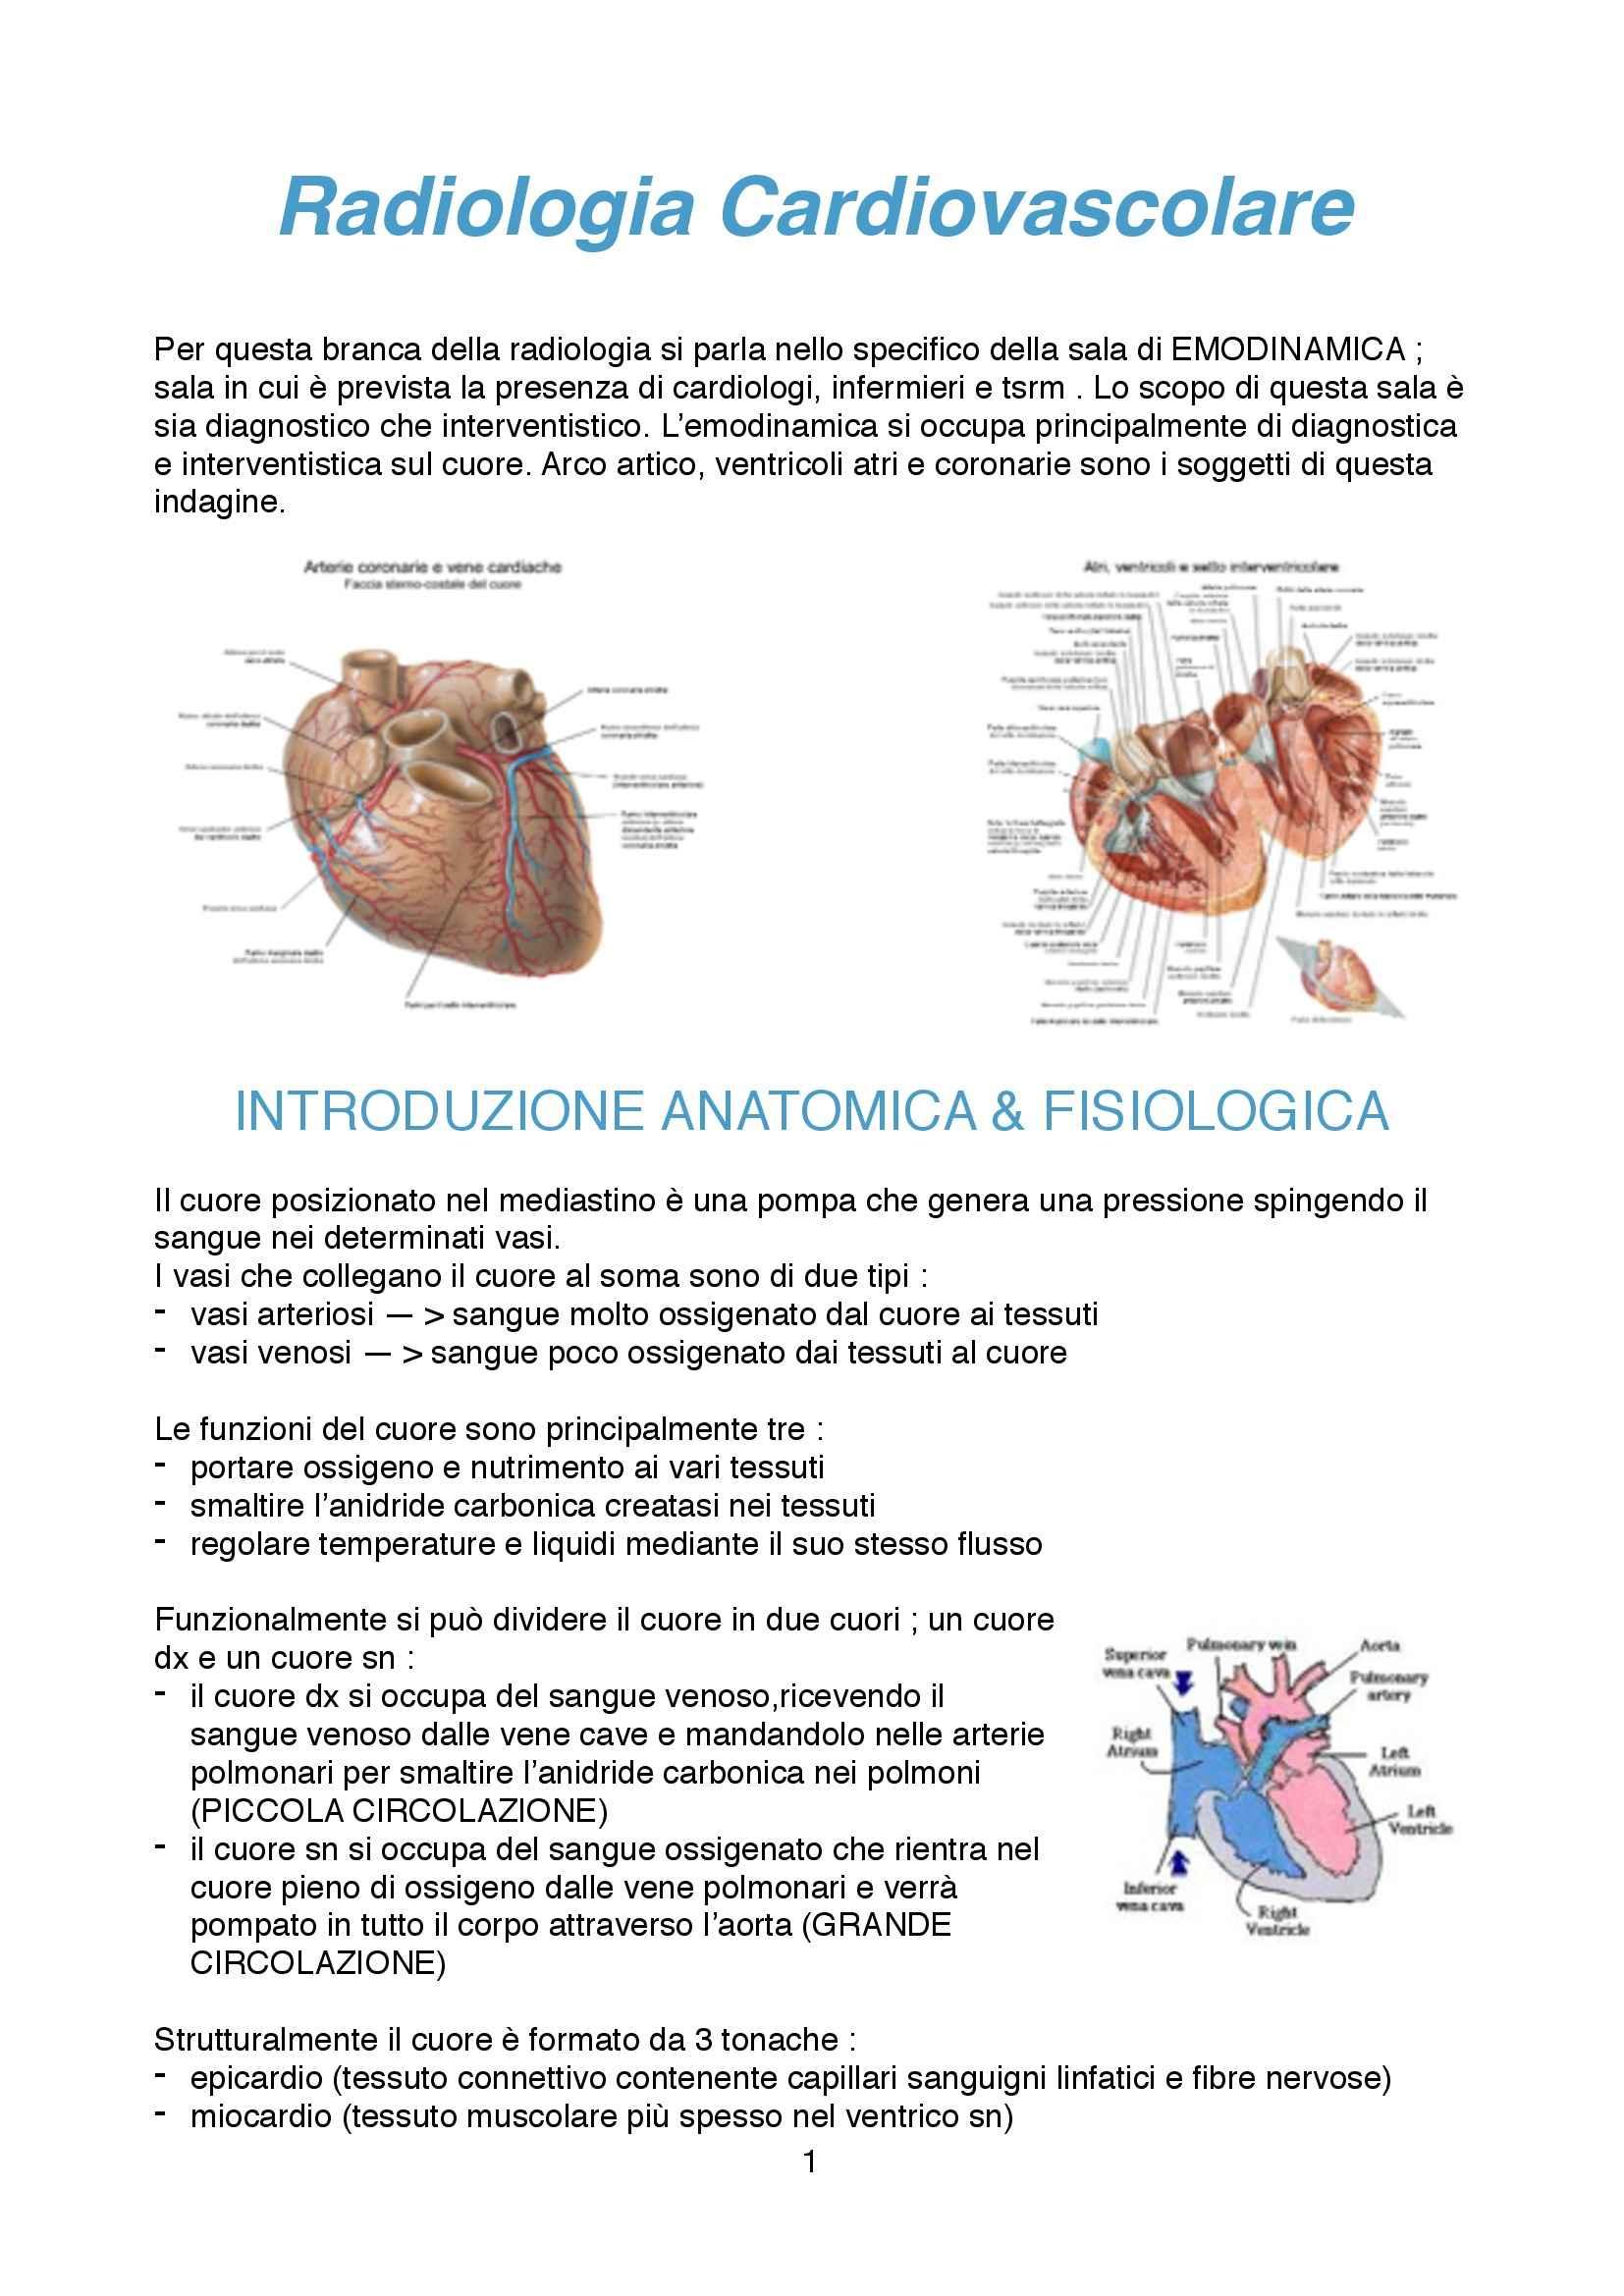 Diagnostica vascolare - anatomia cardiologica